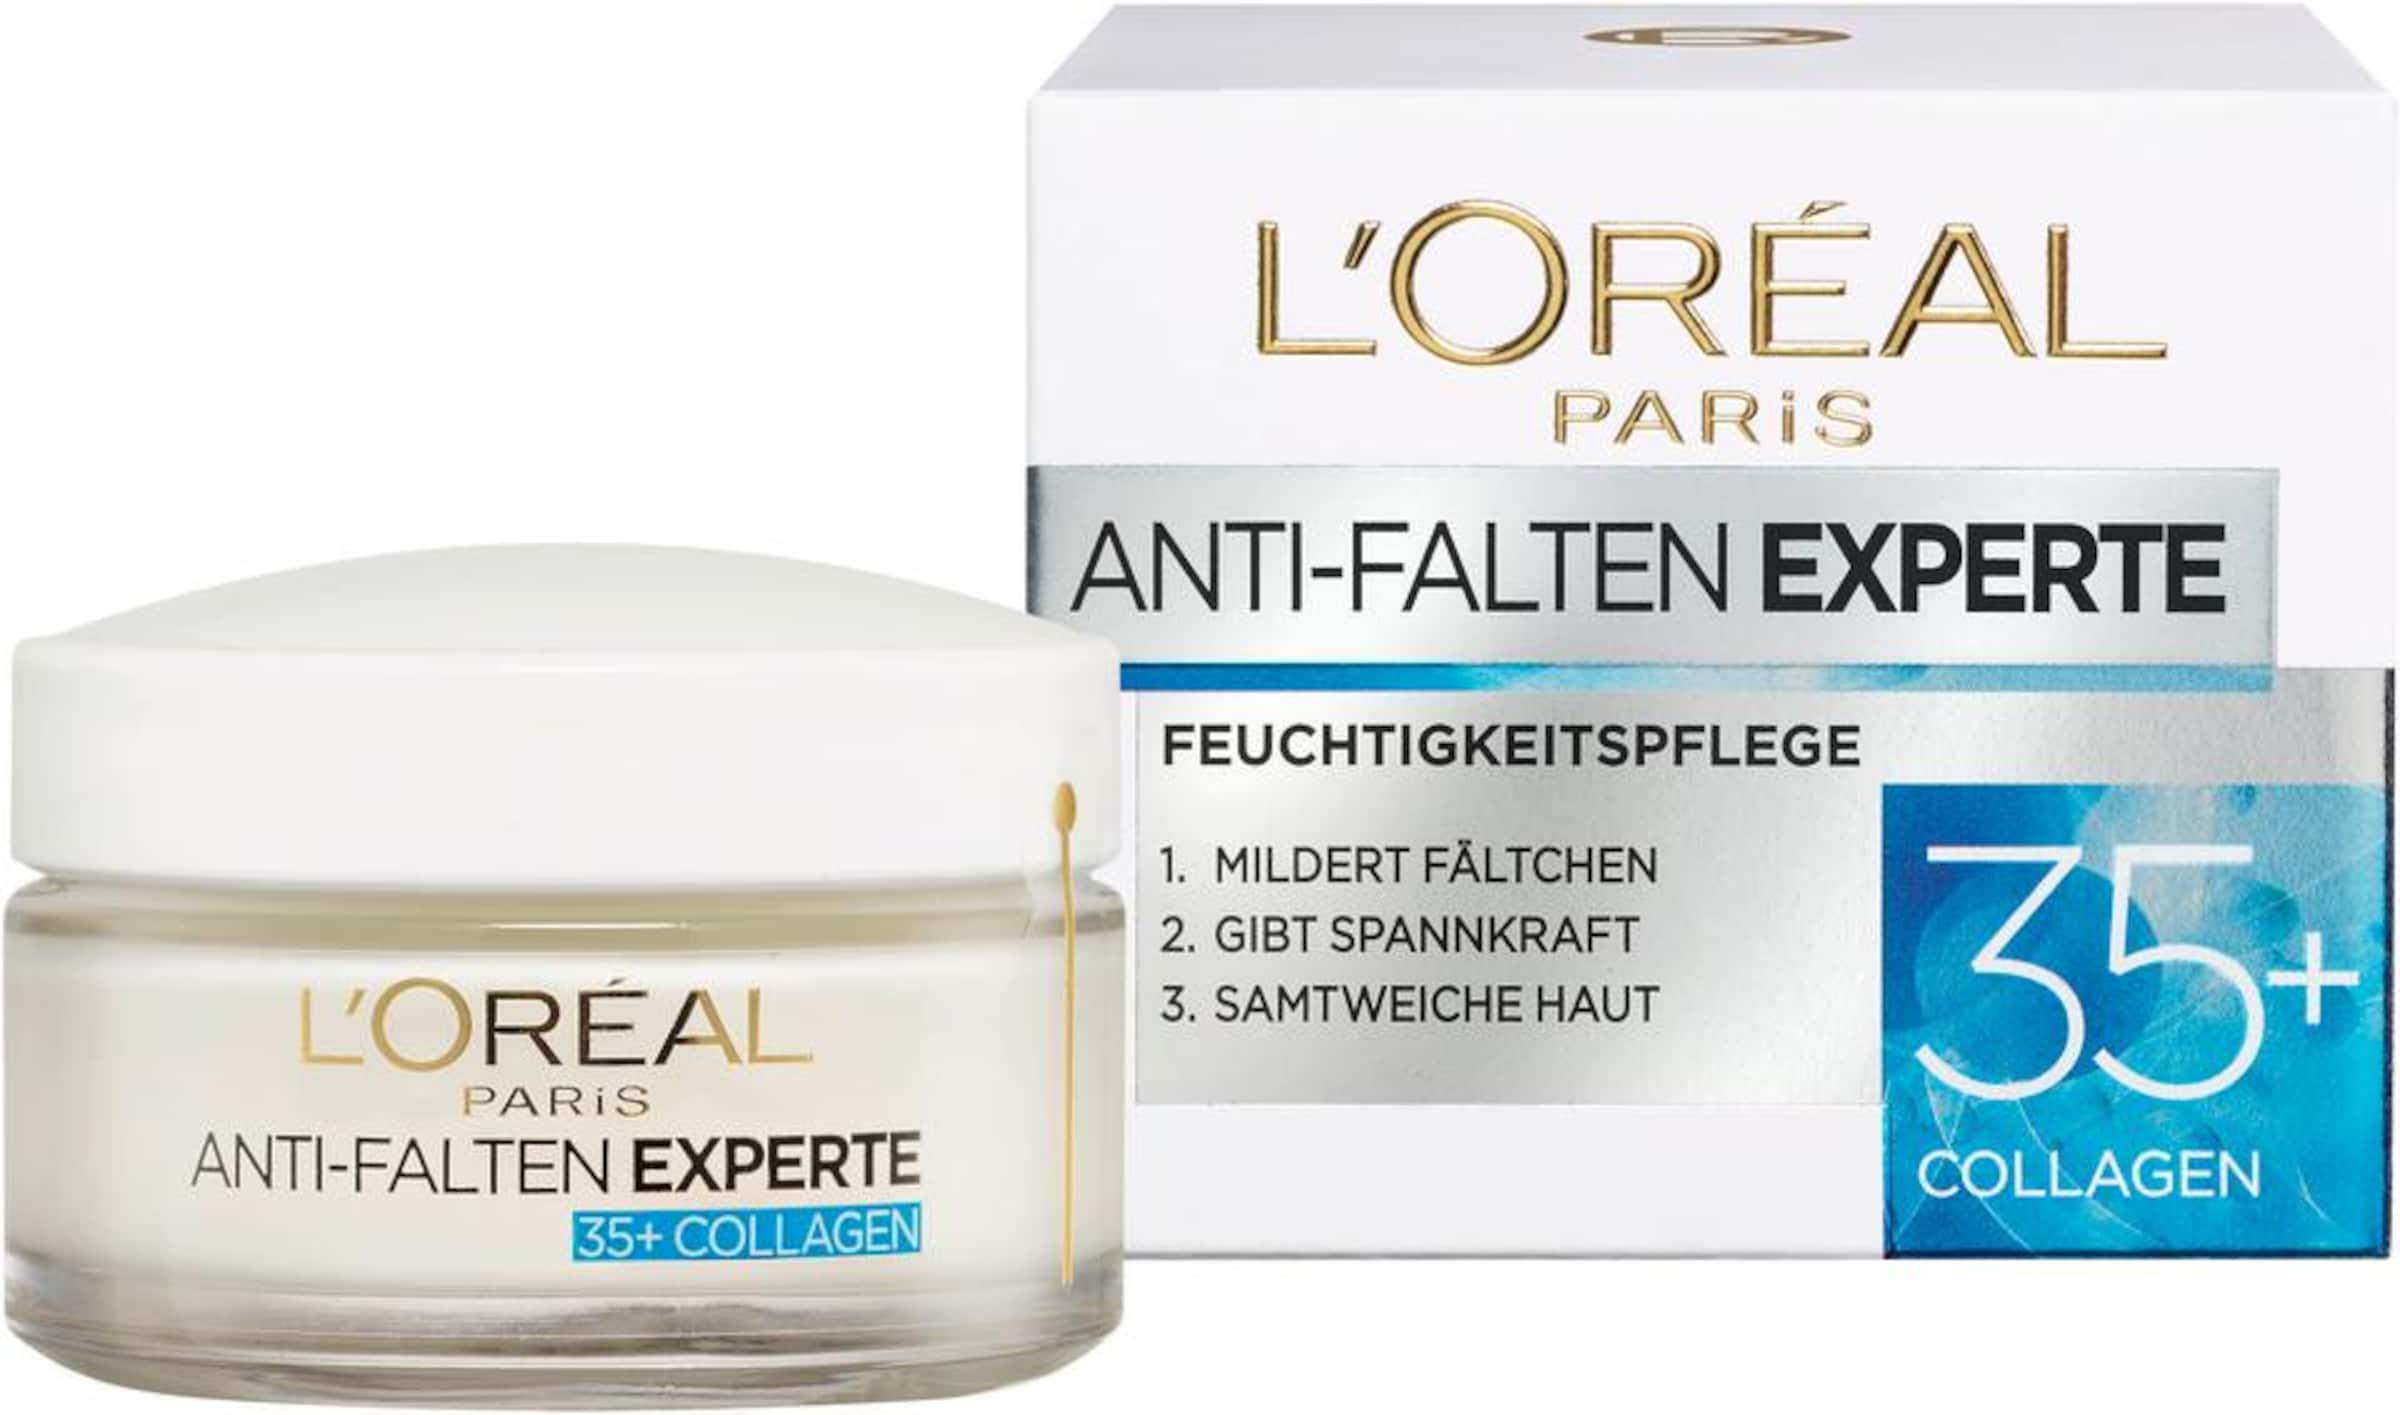 L'Oréal Paris 'Anti-Falten-Expert Collagen 35+', Gesichtspflege